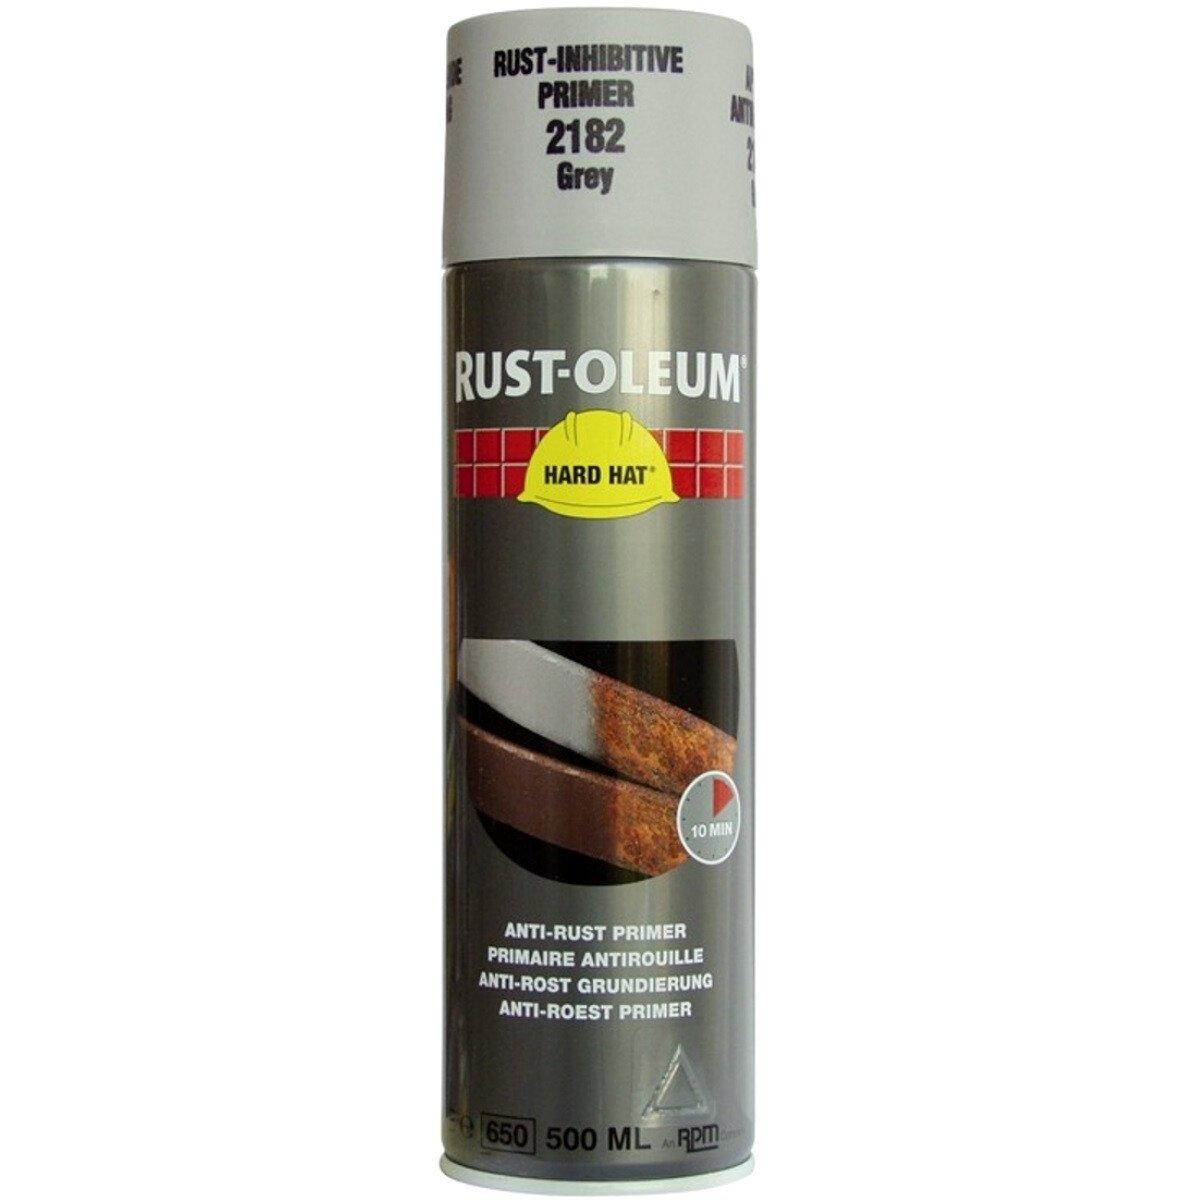 Rustoleum 2182 Rust-Inhibitive Grey Primer 500ml Aerosol Spray Paint